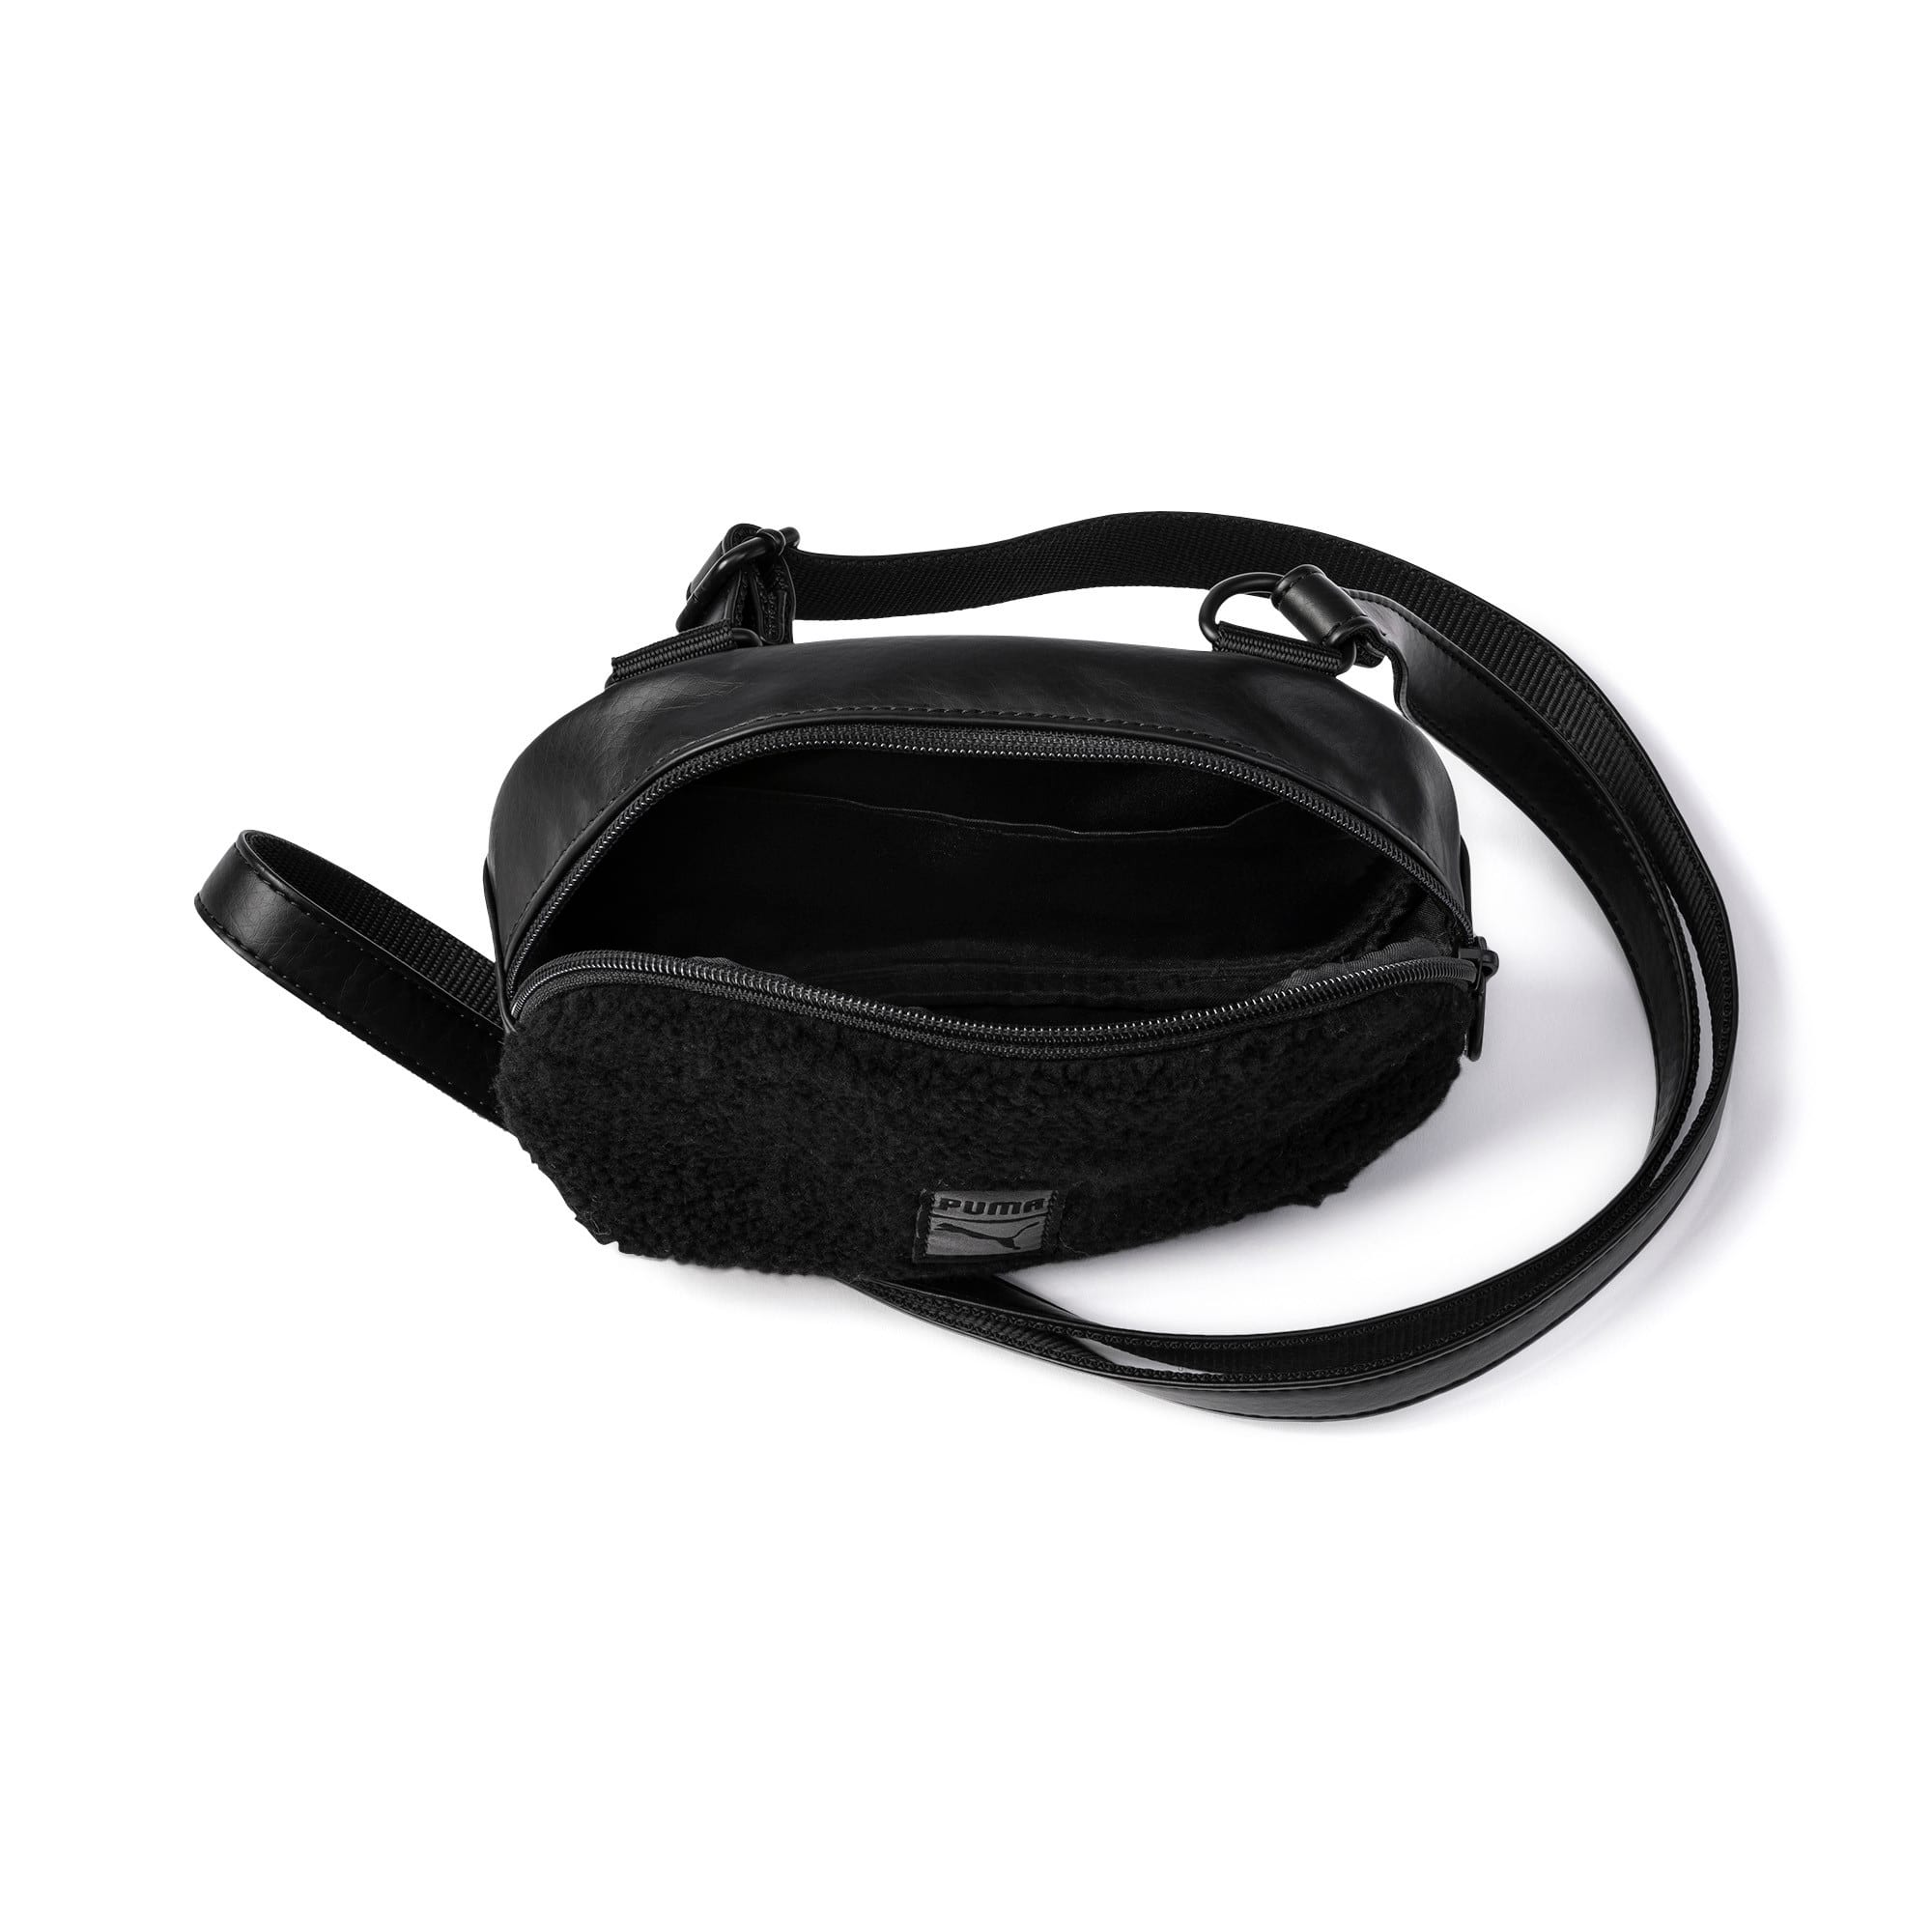 Thumbnail 4 of Prime Time Crossbody Bag, Puma Black-Puma Black, medium